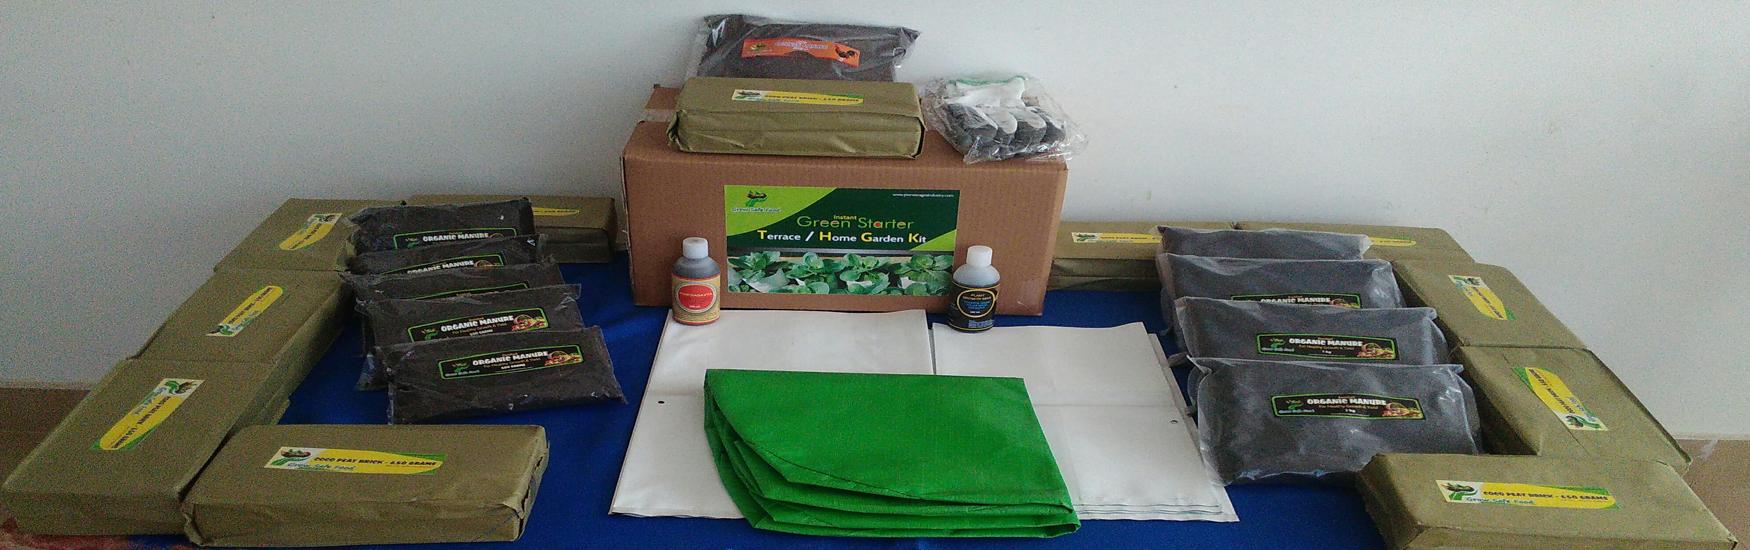 Terrace gardening pioneer agro industries green for Indoor gardening kit green toys